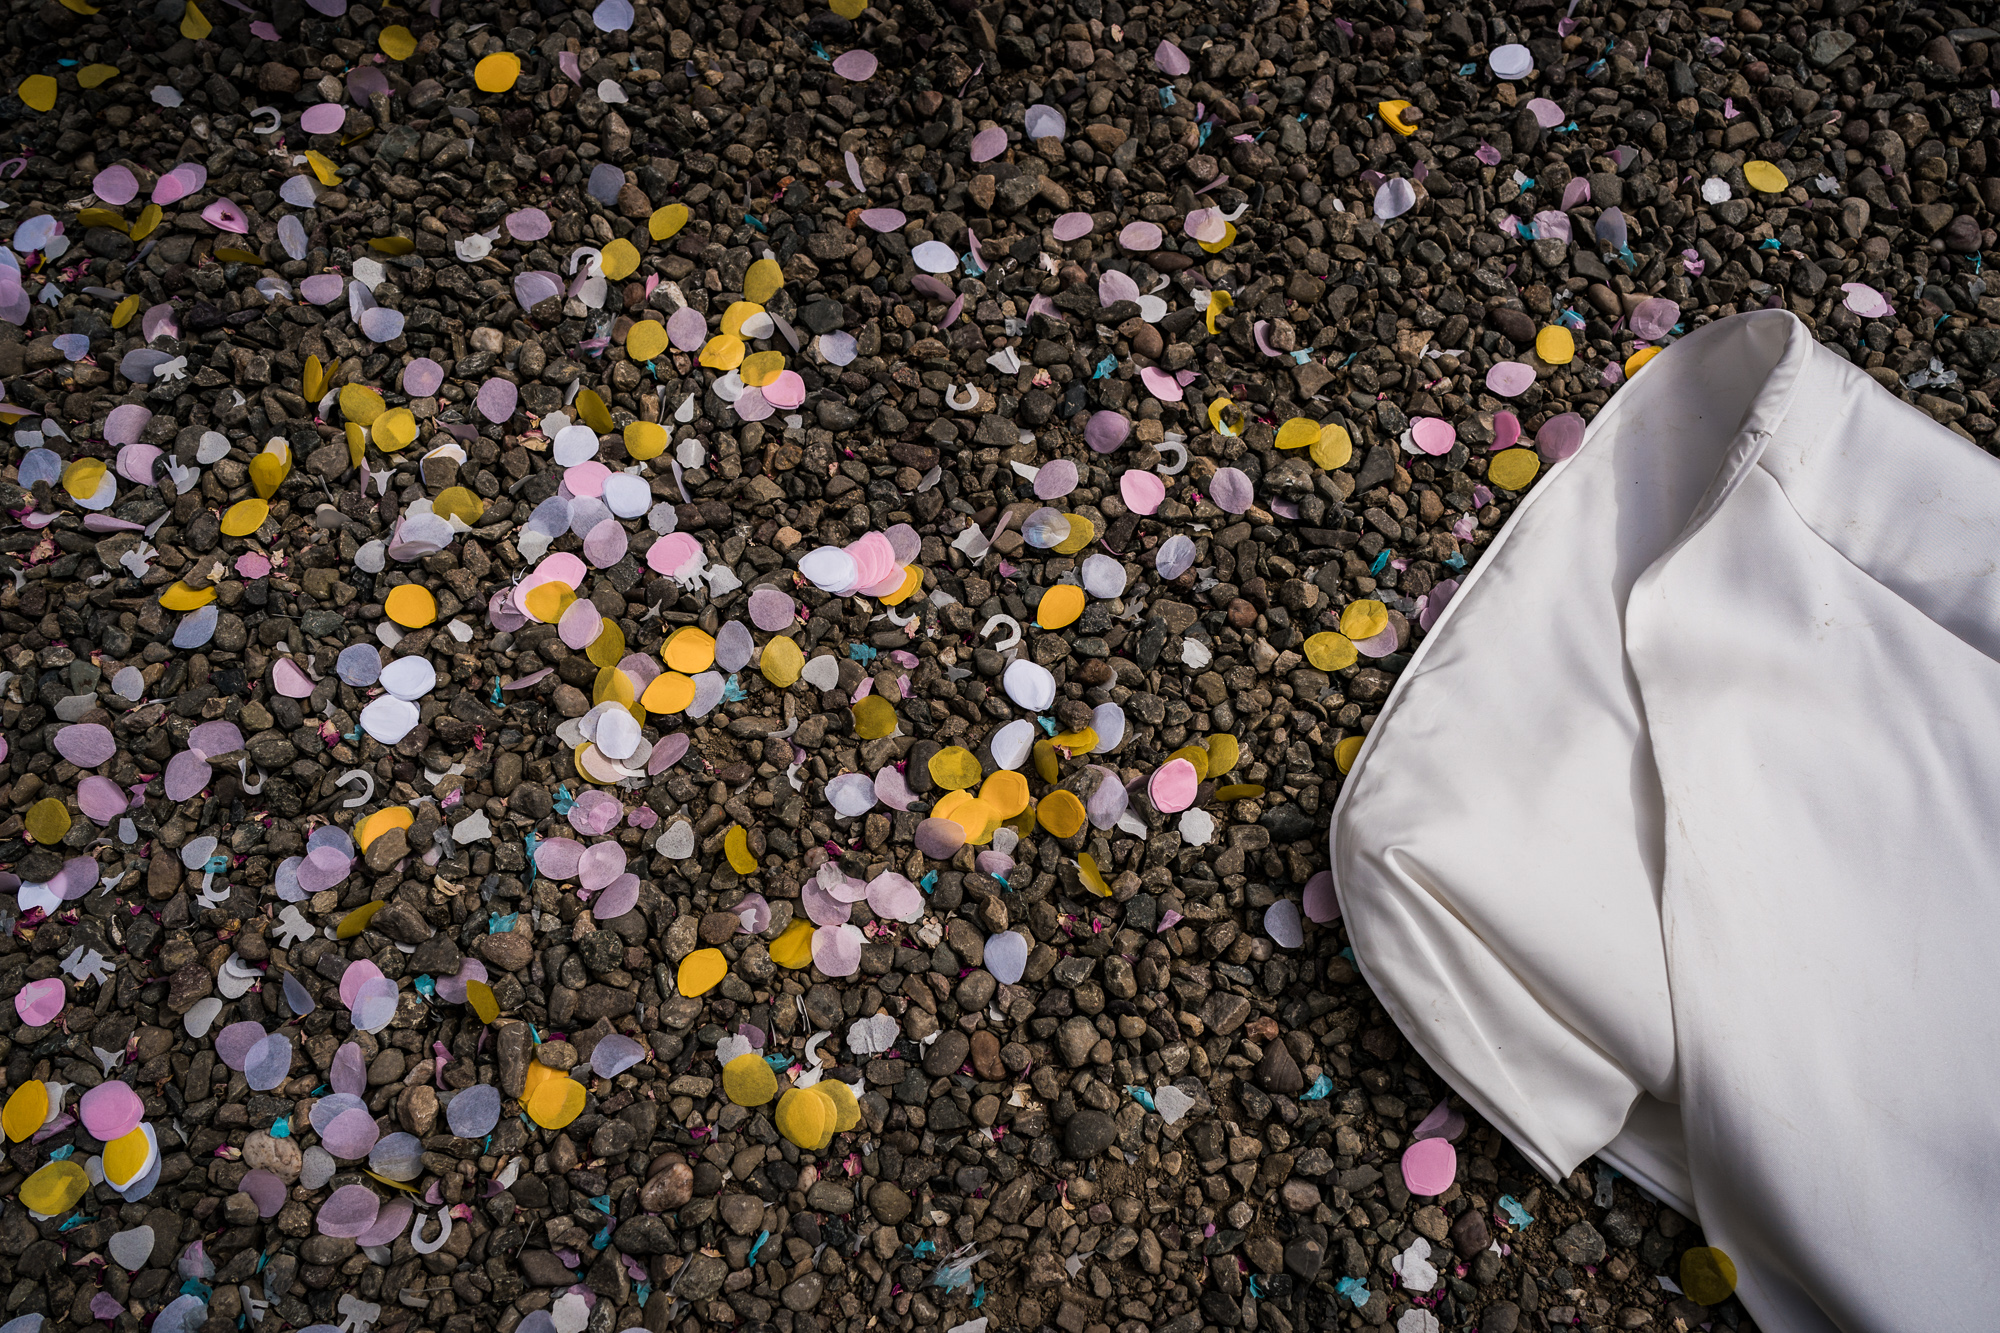 Confetti aftermath.